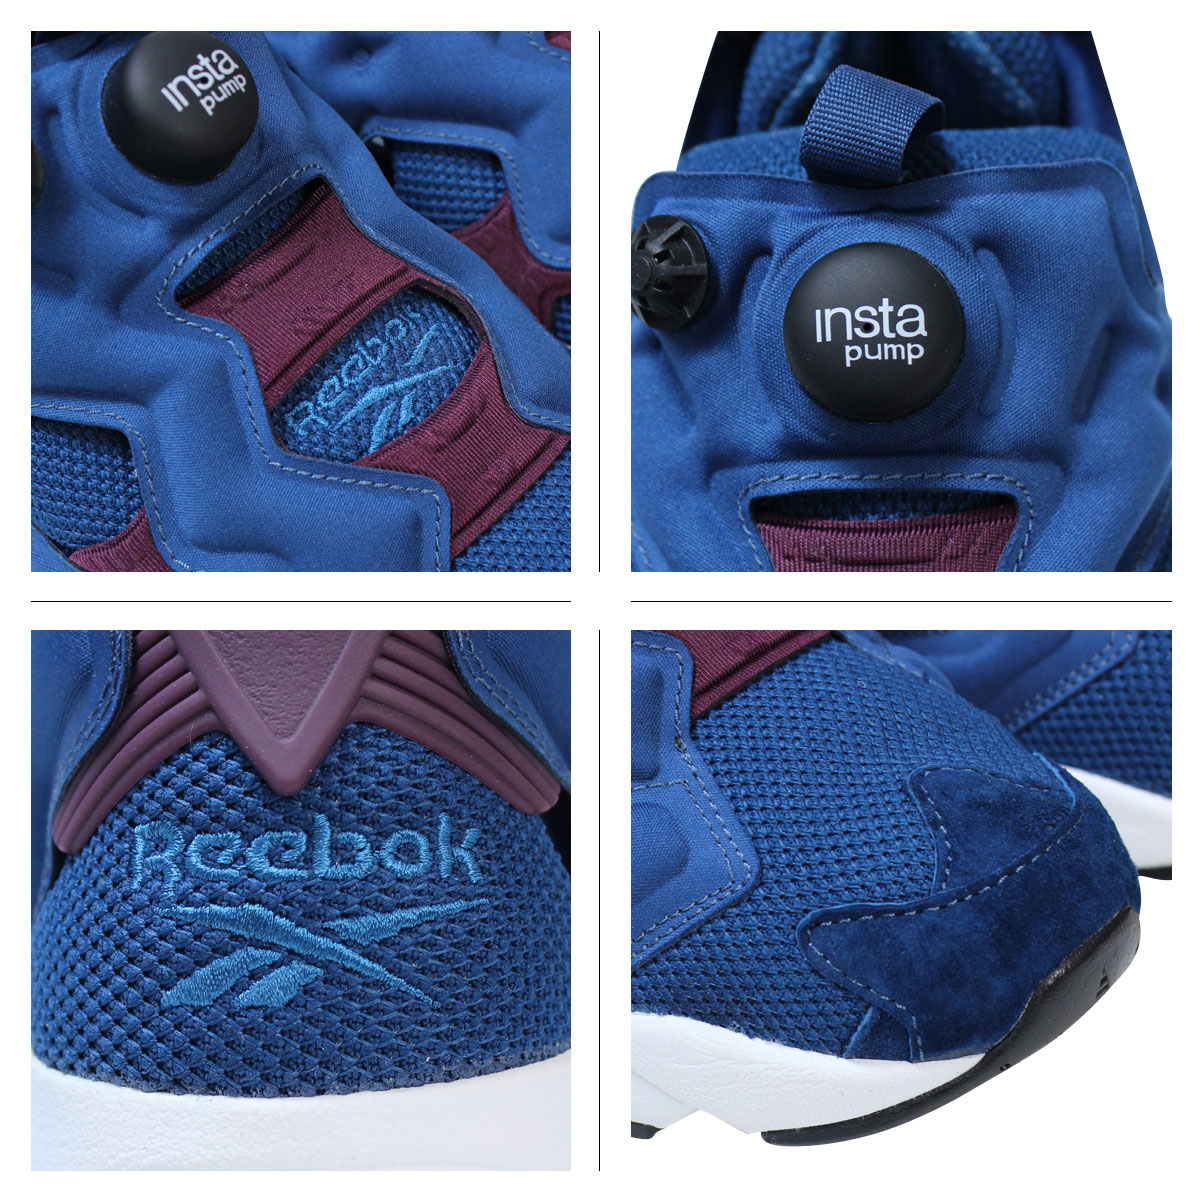 476952ba3b1 Reebok Reebok pump fury sneakers INSTA PUMP FURY OG 20th anniversary M46895  men s women s shoes purple